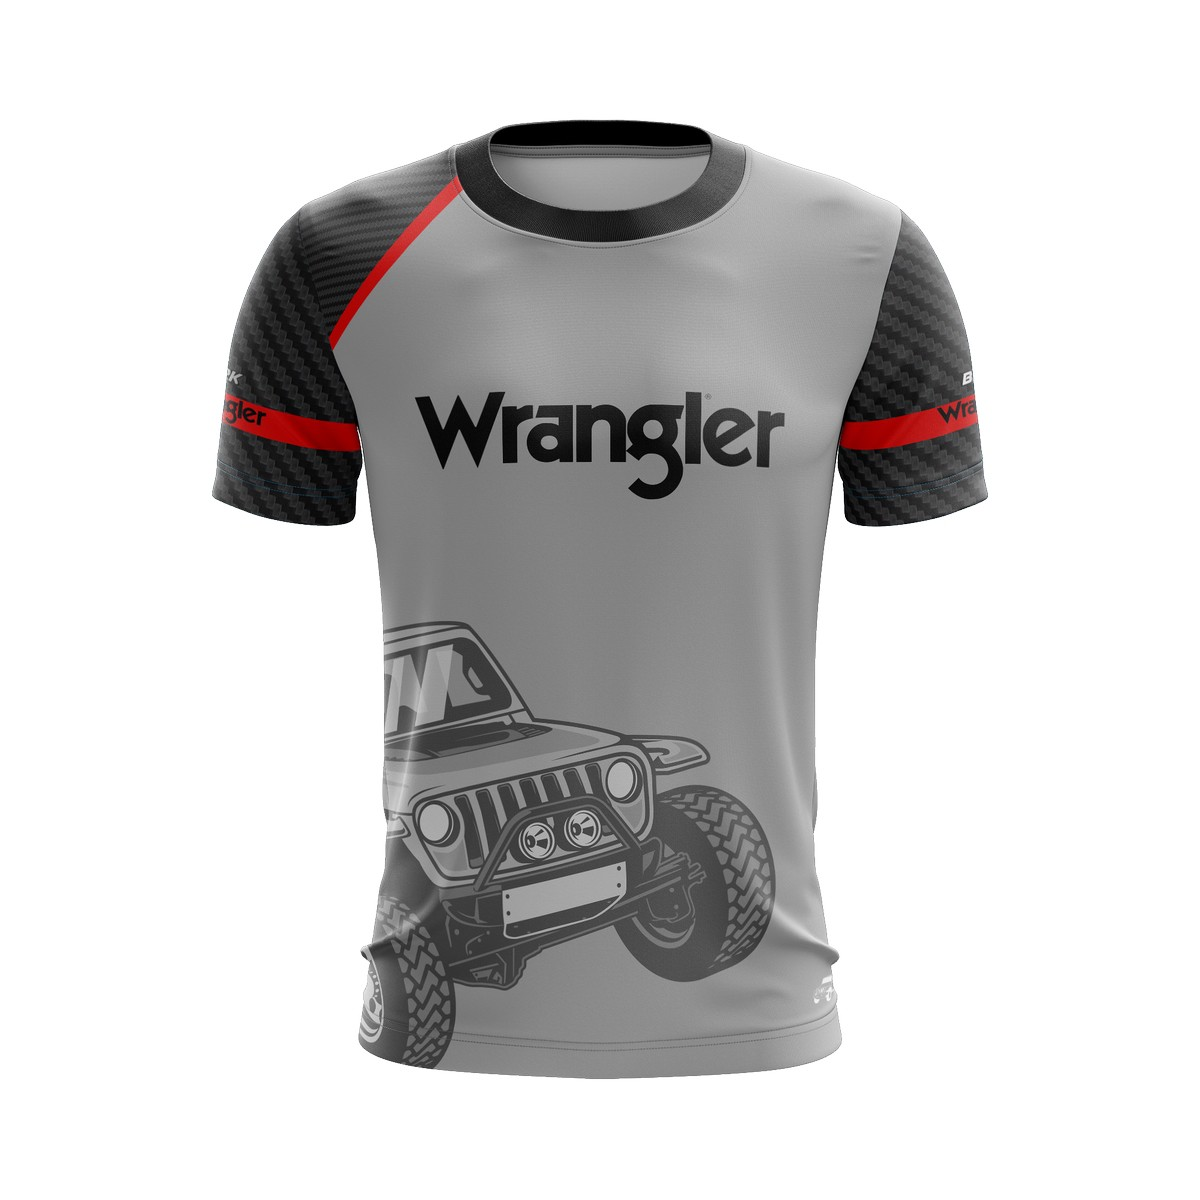 Camiseta Wrangler Casual 01 Brk Off Road Tecido Dry